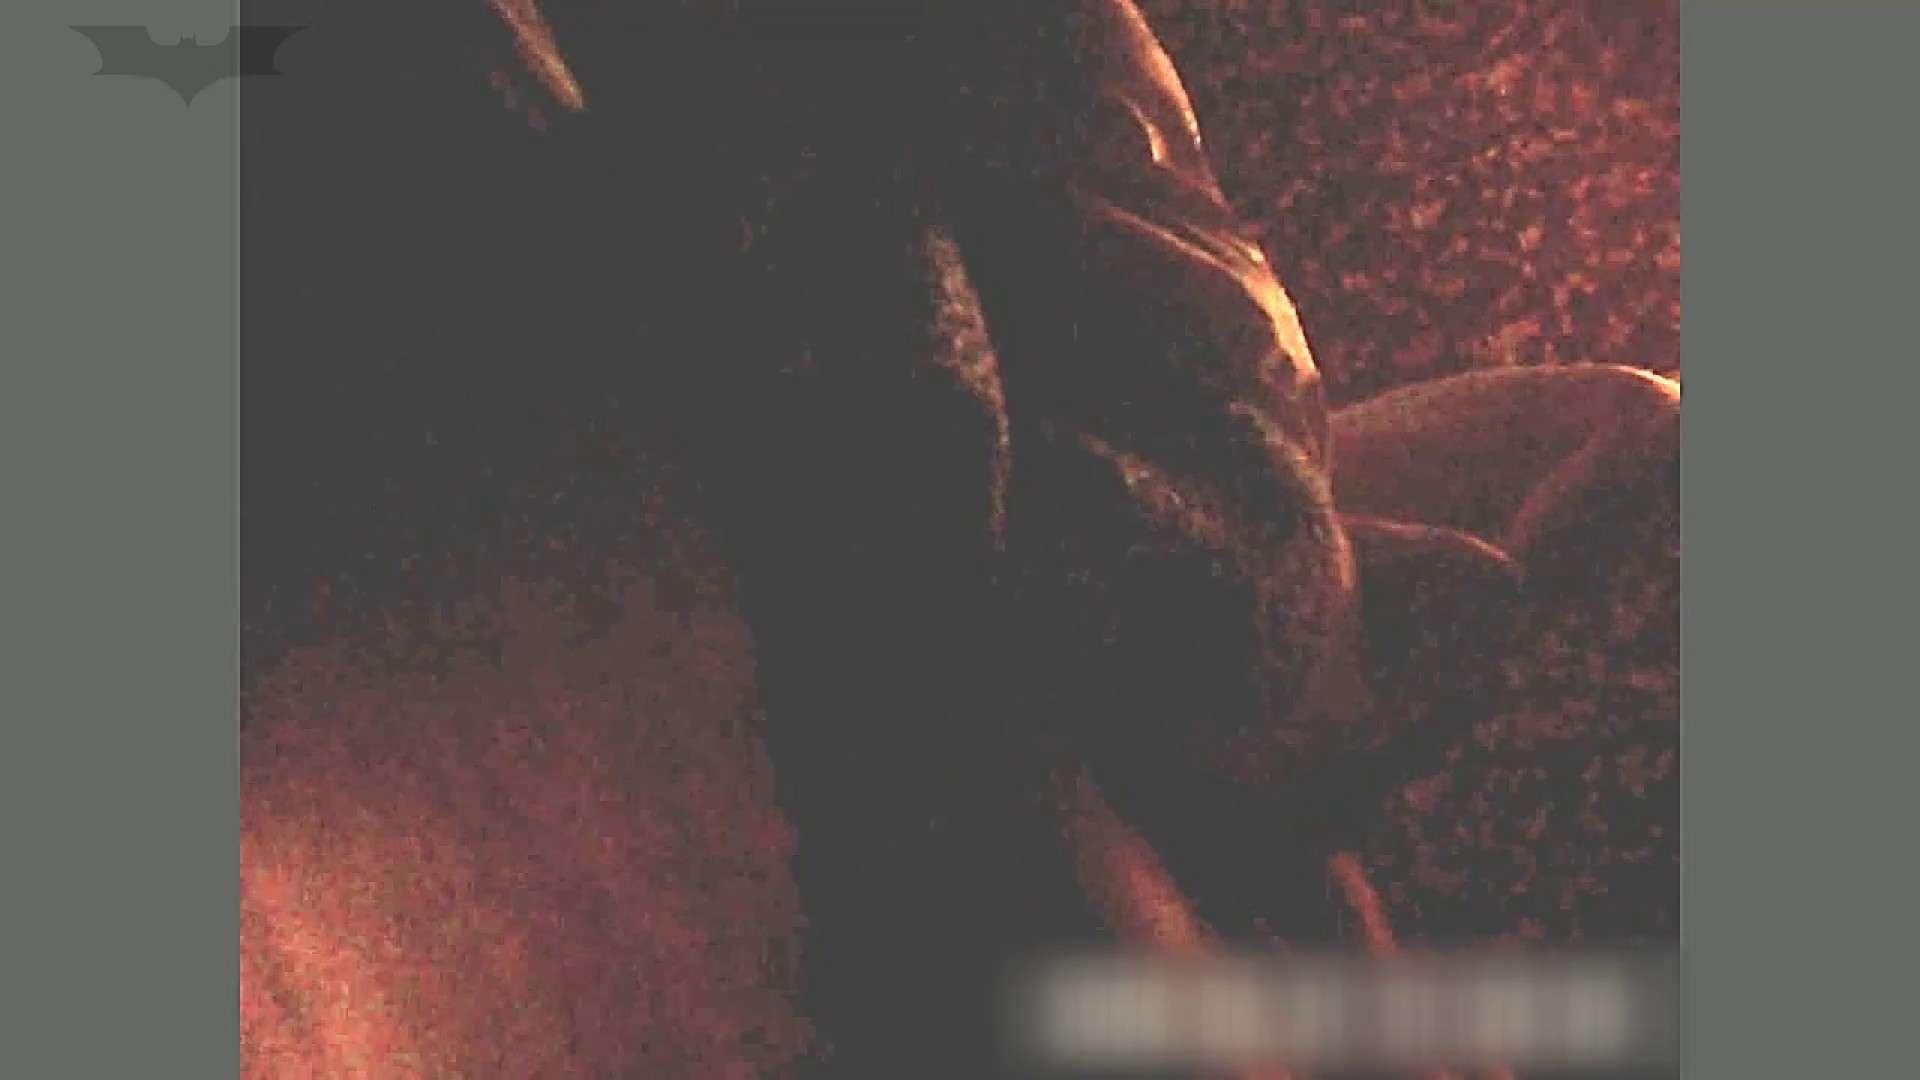 ▲2017_05位▲ 学園アイドル美人女子大生!❶4人厳選詰合せVol.49 人気作   女子大生  113画像 59